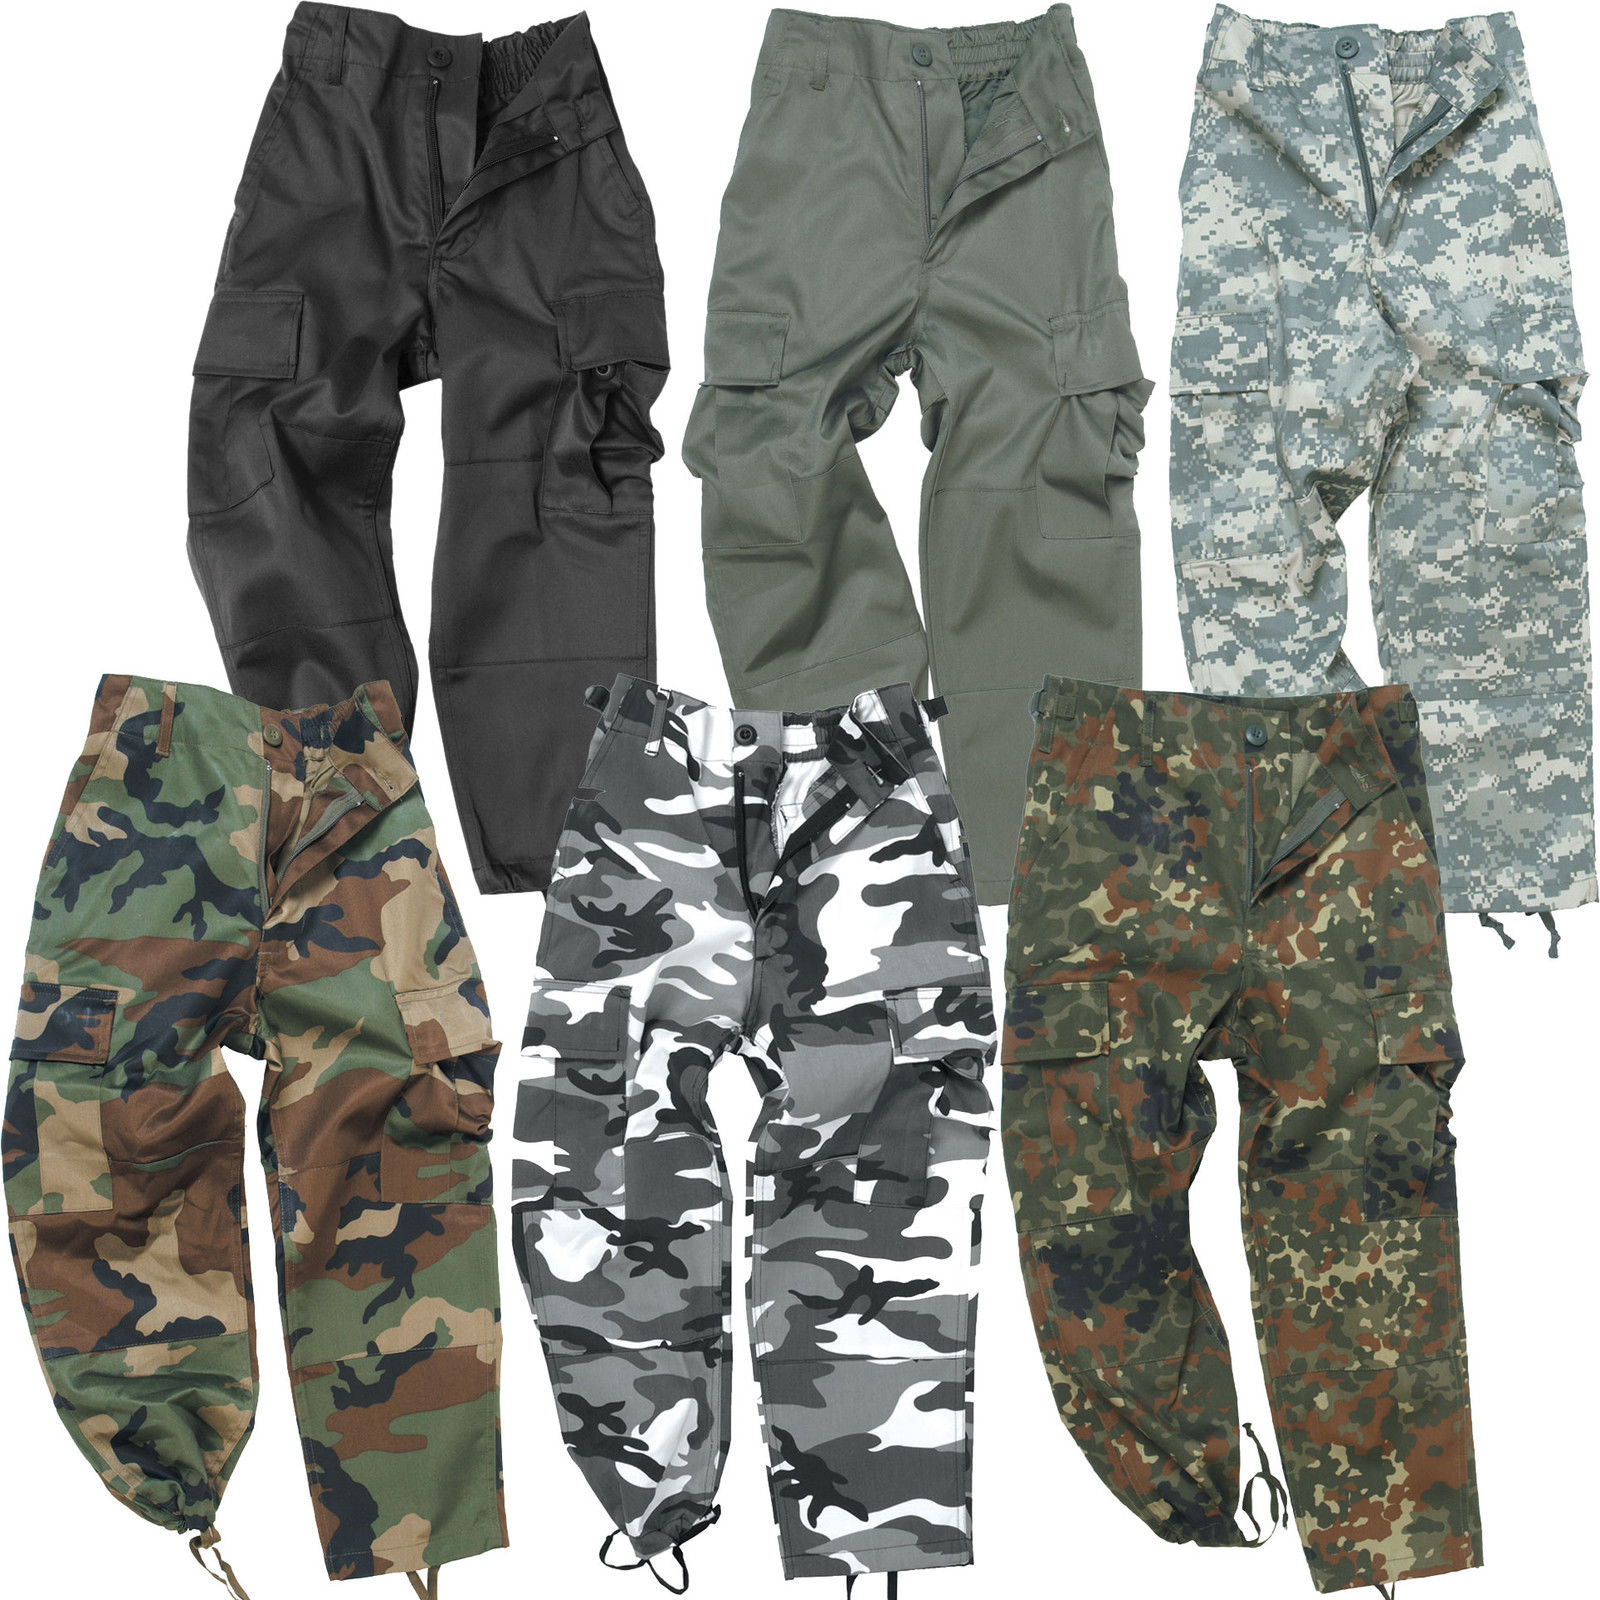 populärer Stil sehr günstig High Fashion Details zu US Kinderhose BDU XS-XXL Outdoor Cargo Army Tarnhose Kinder  Ranger Hose tarn Neu